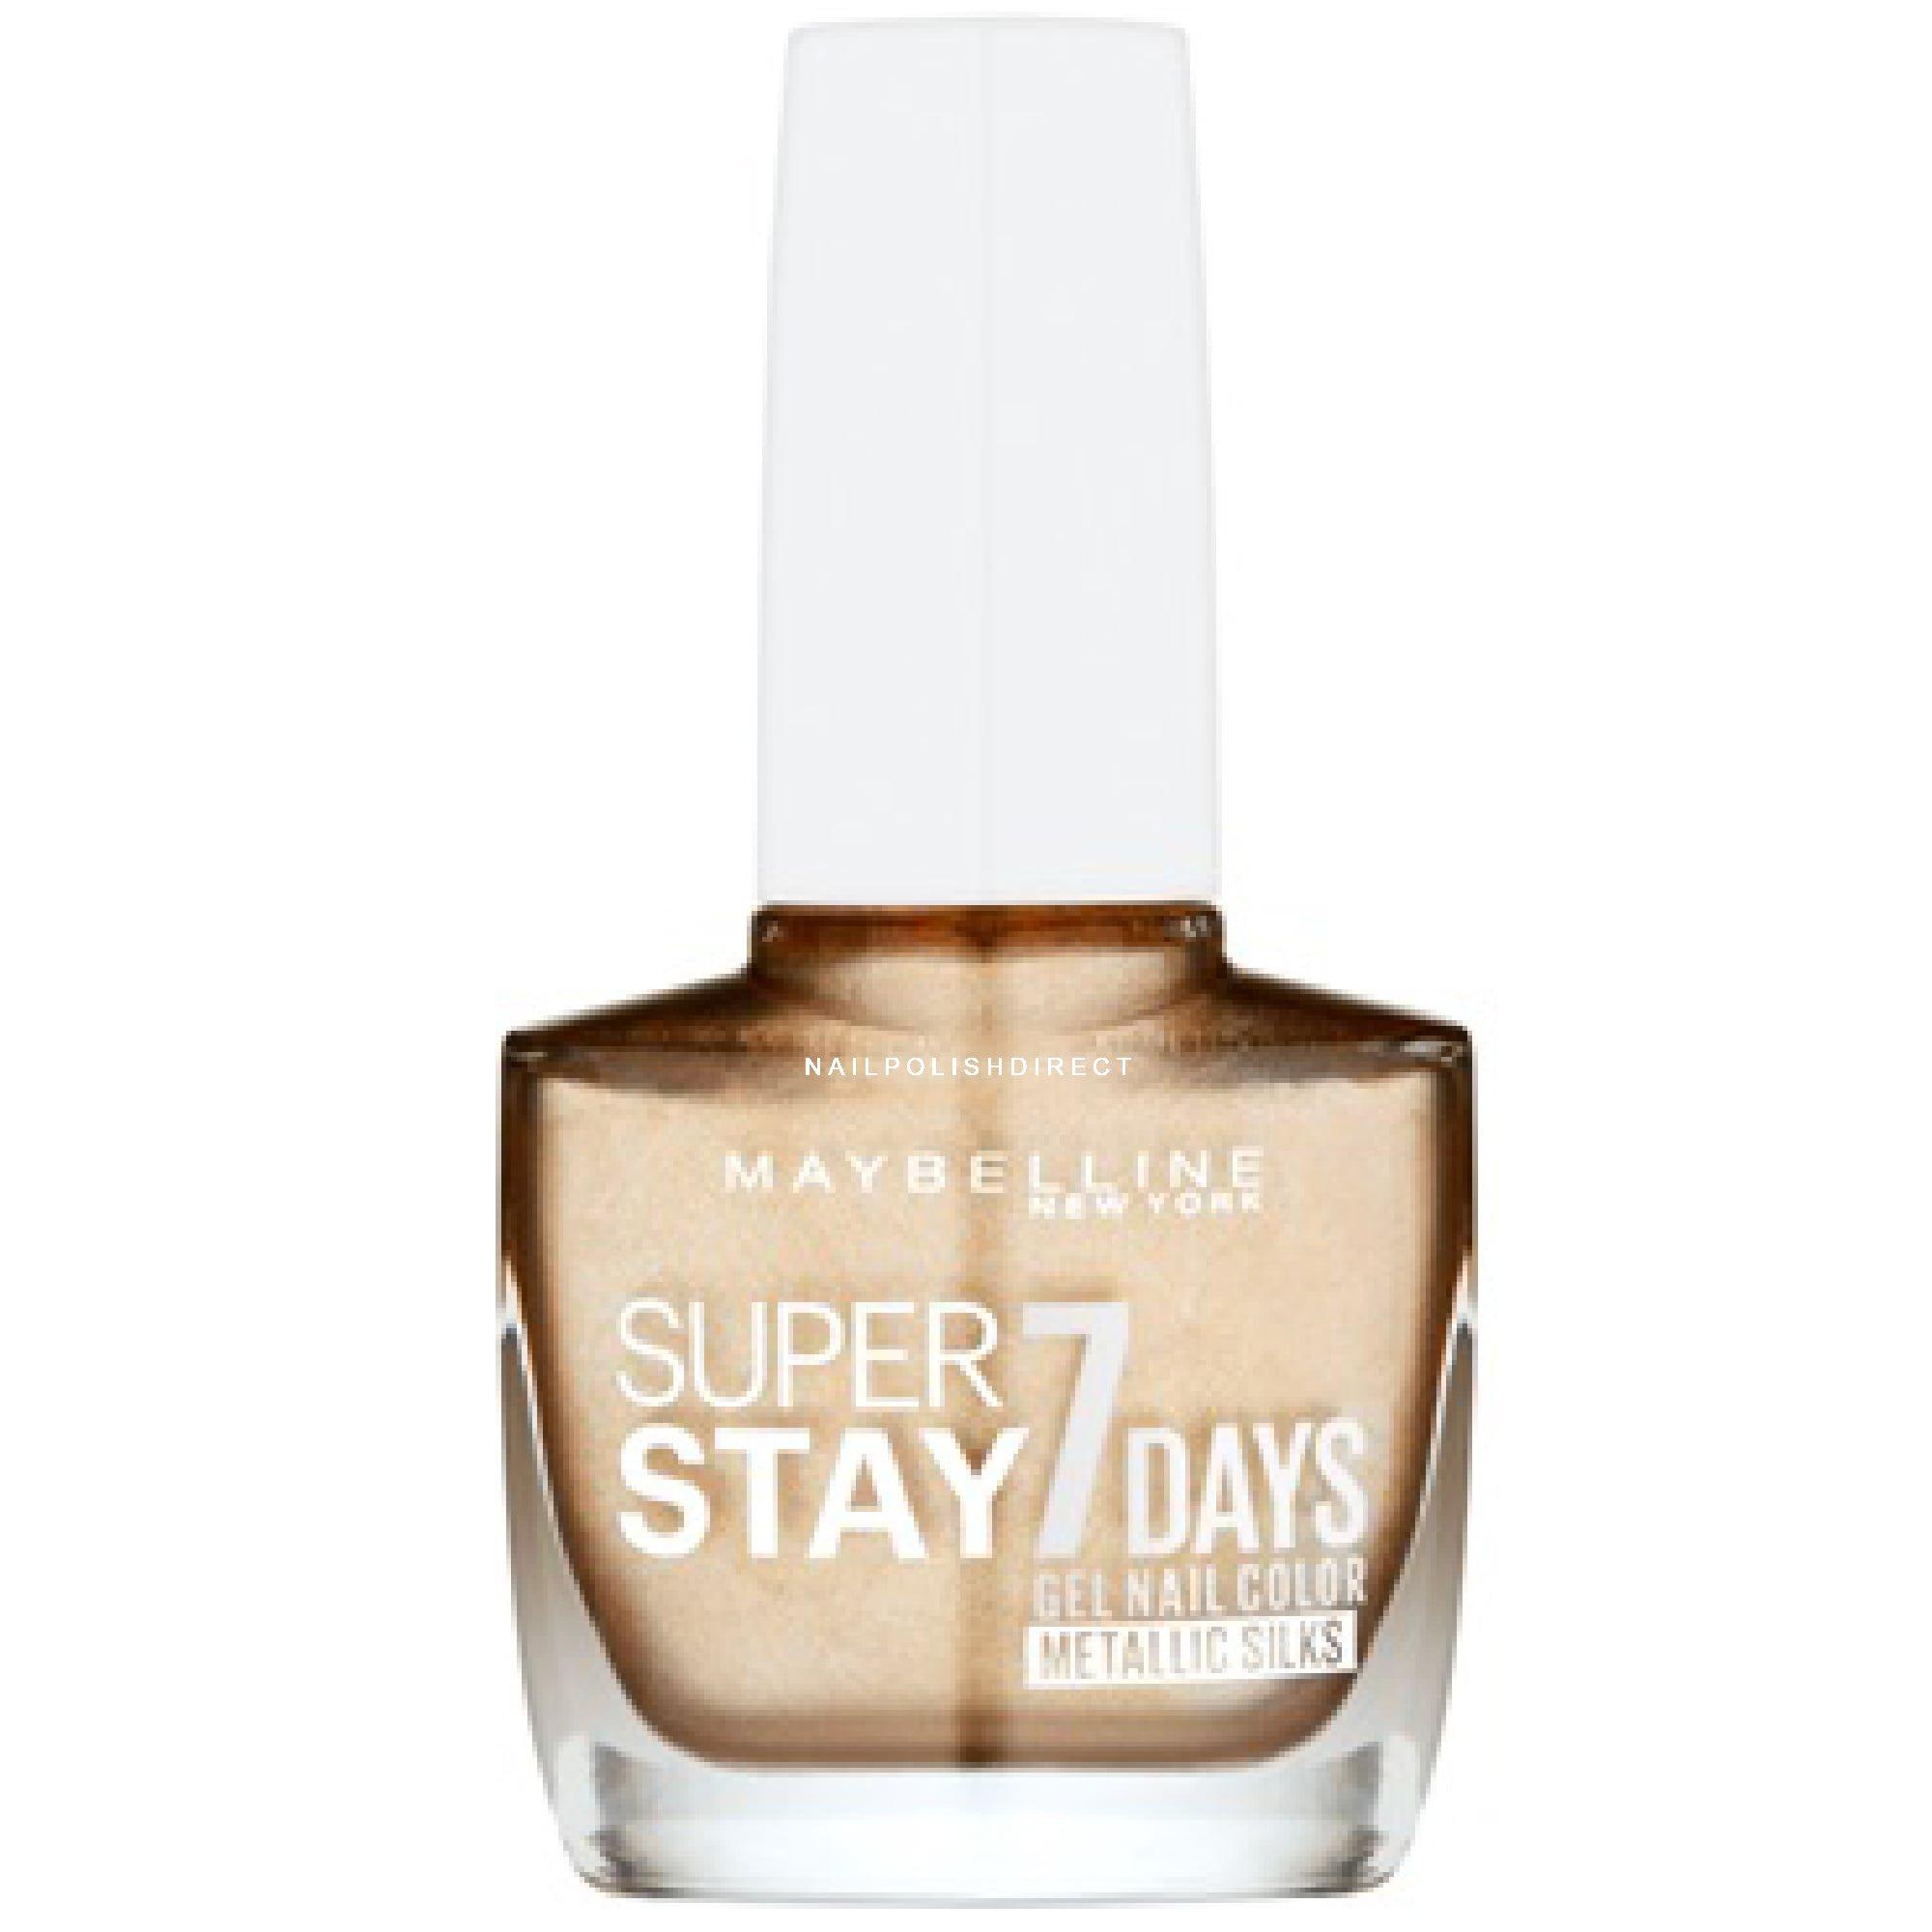 Nyc Metallic Nail Polish: Maybelline New York Super Stay 7 Days Nail Polish